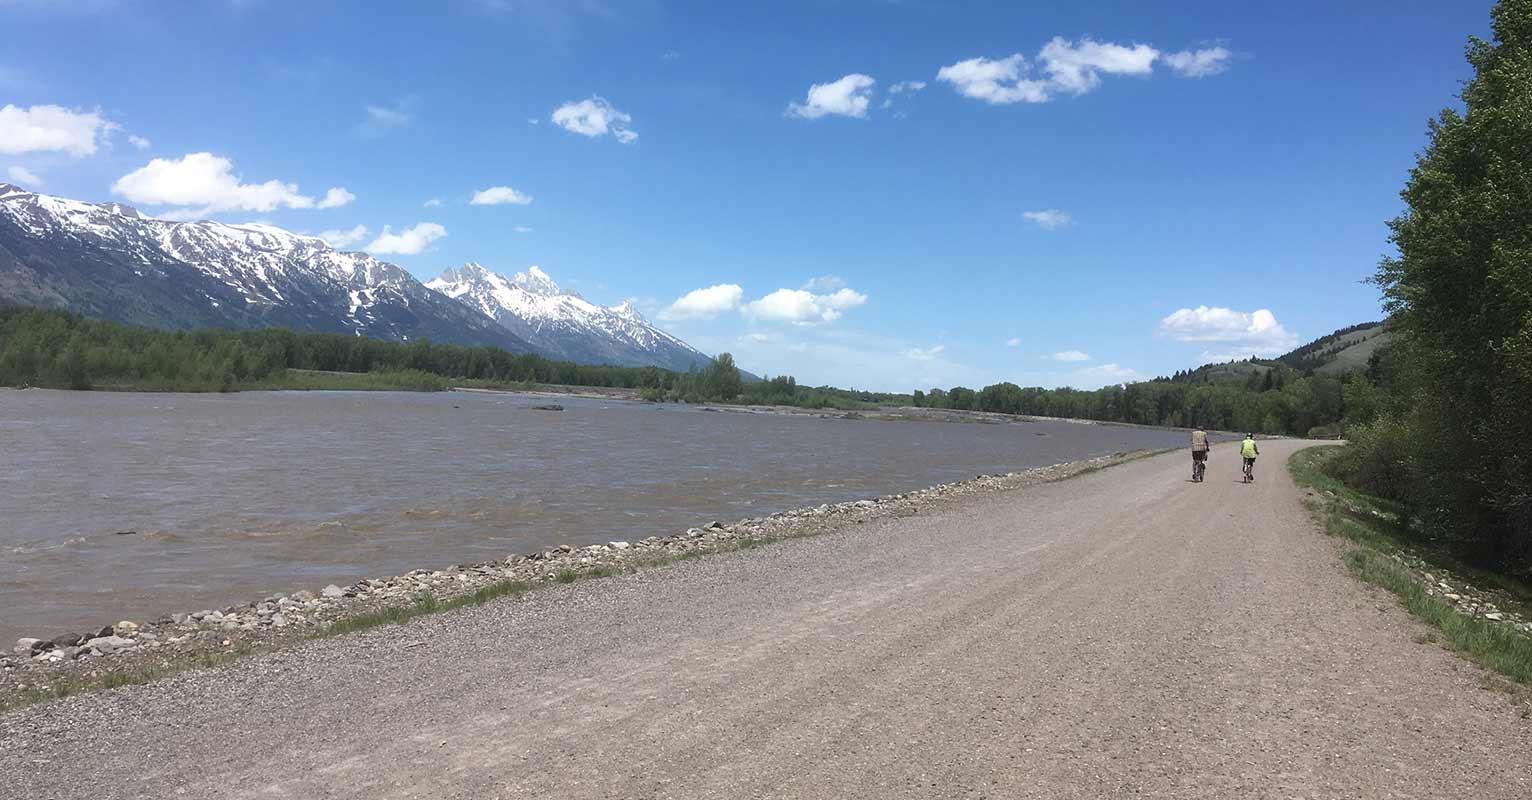 Biking in Jackson Hole Wyoming